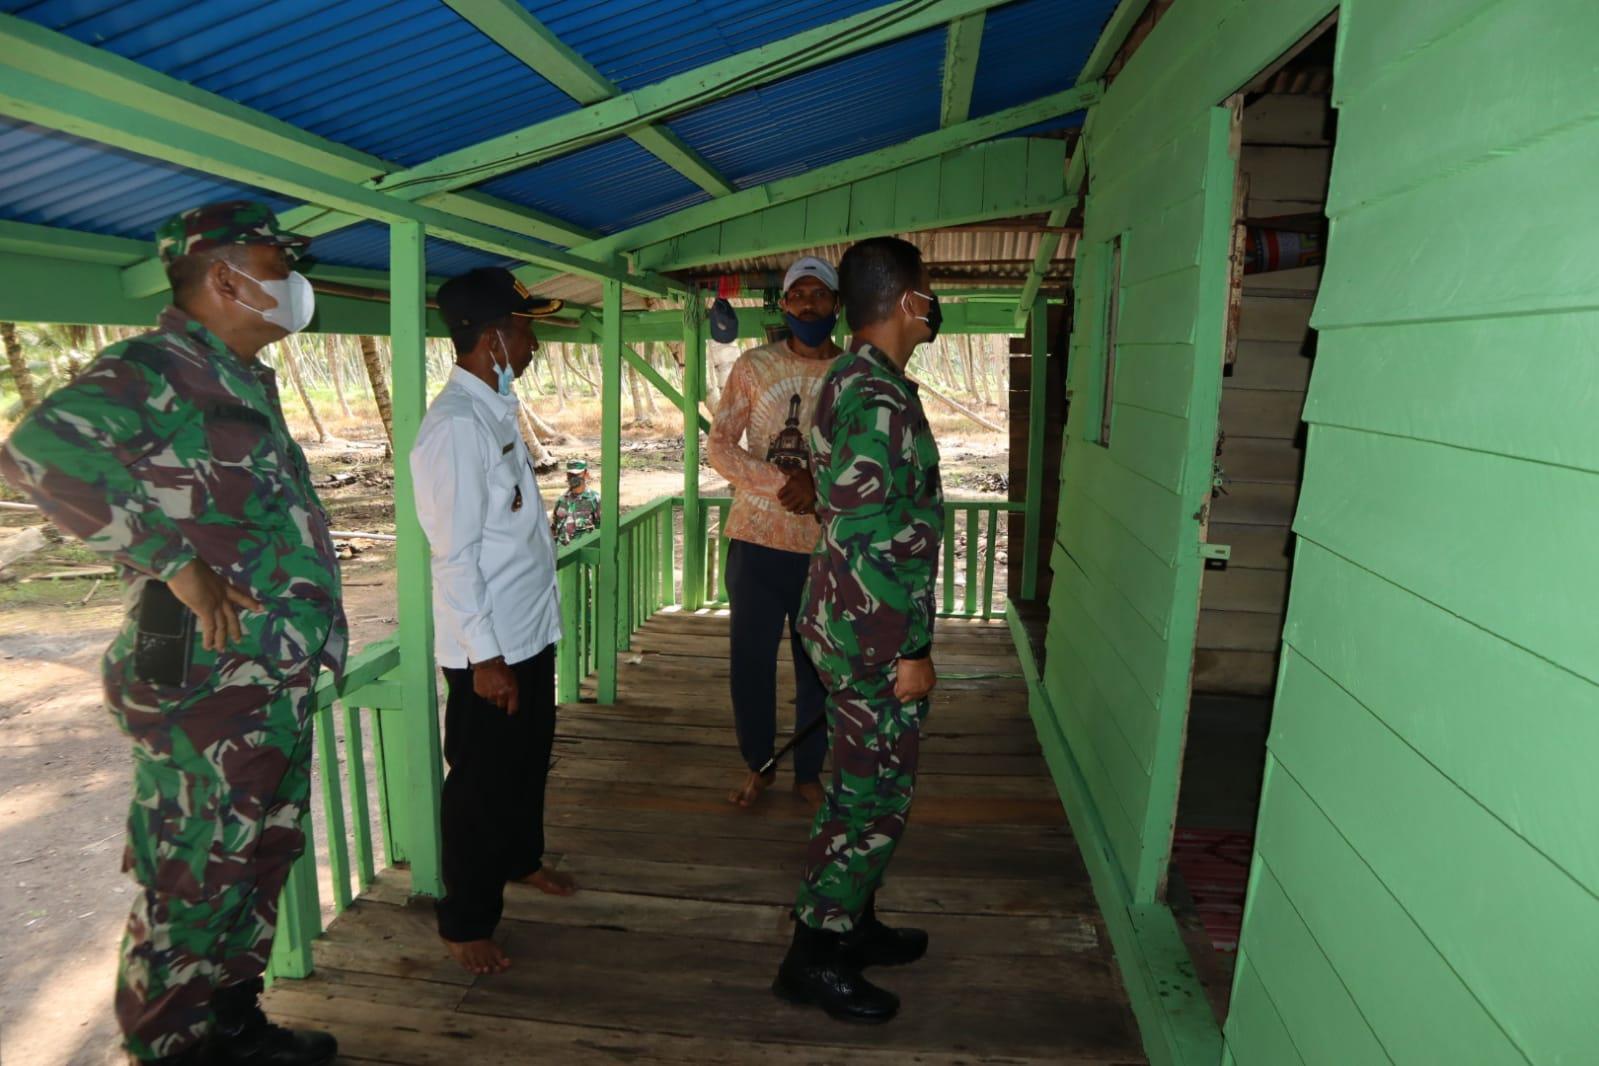 Dandim 0314 Inhil Tinjau Bedah Rumah di Dua Kecamatan